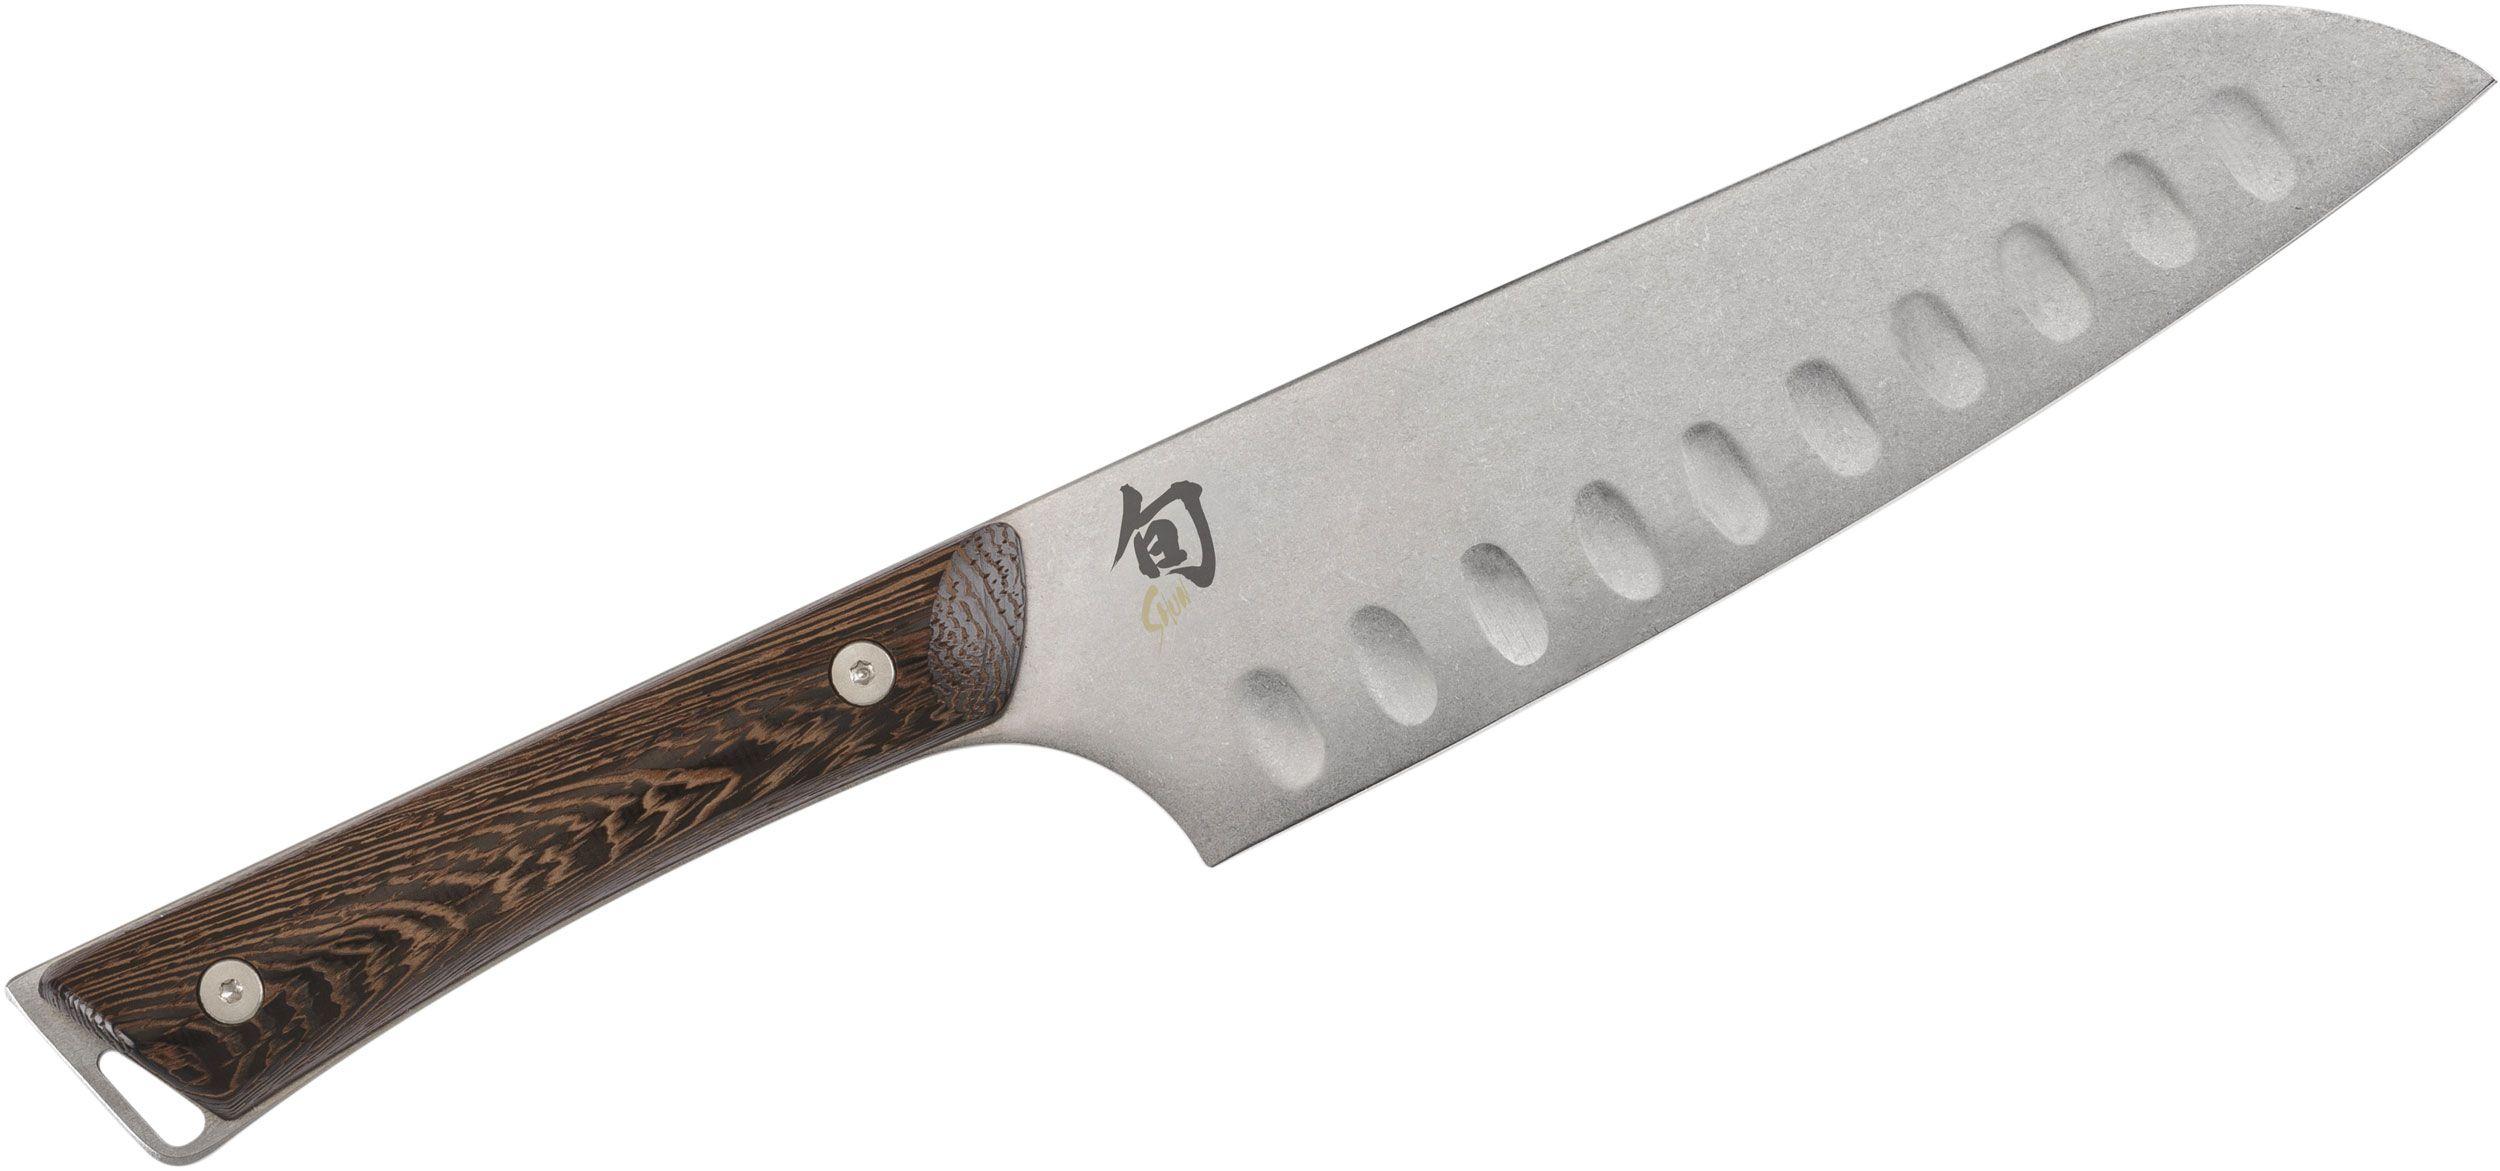 Shun SWT0718 Kanso Hollow Ground Santoku Knife 7 inch Blade, Tagayasan Wood Handles